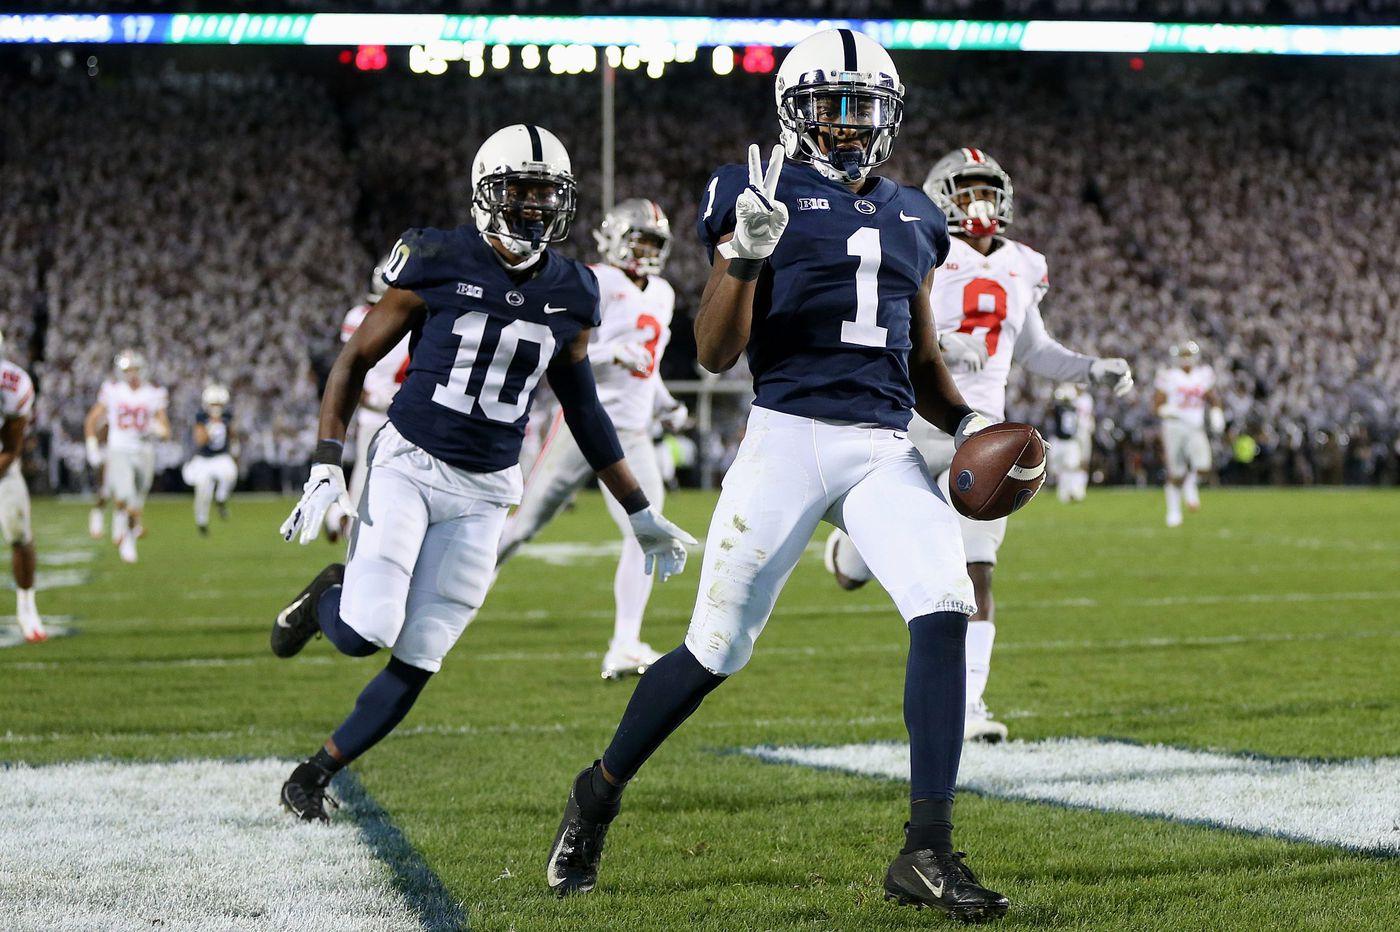 Penn State's K.J. Hamler makes some serious plays while having fun